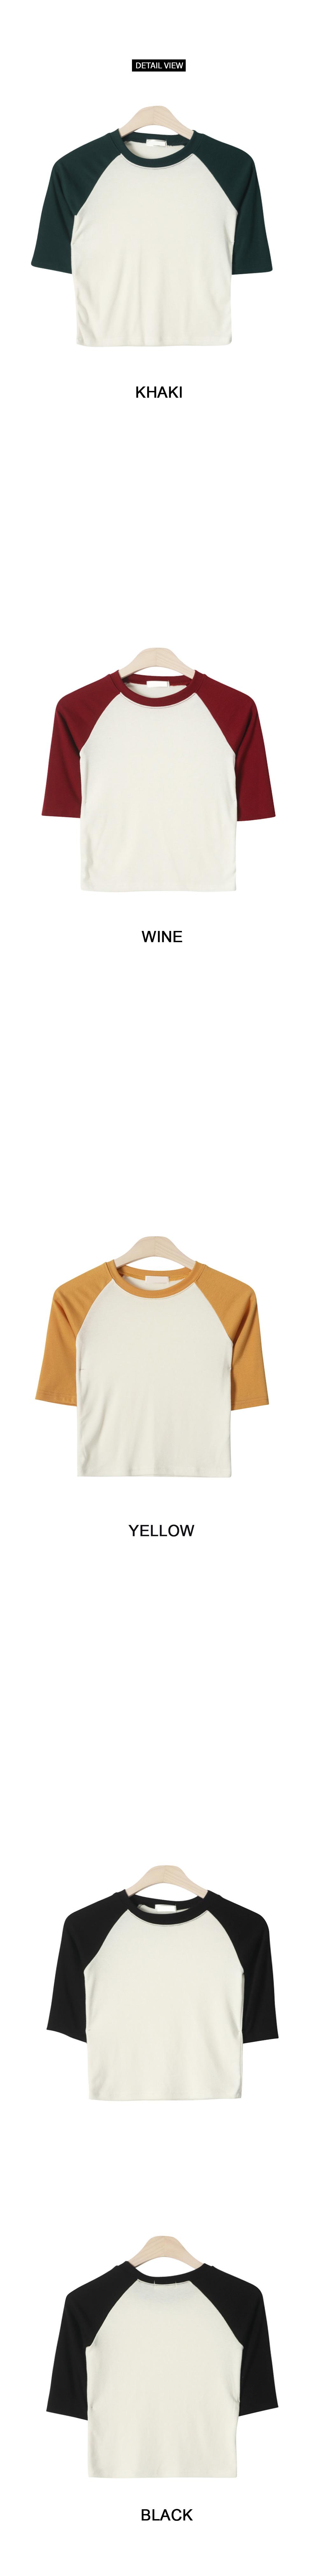 Gram Nagr short sleeve polo shirt